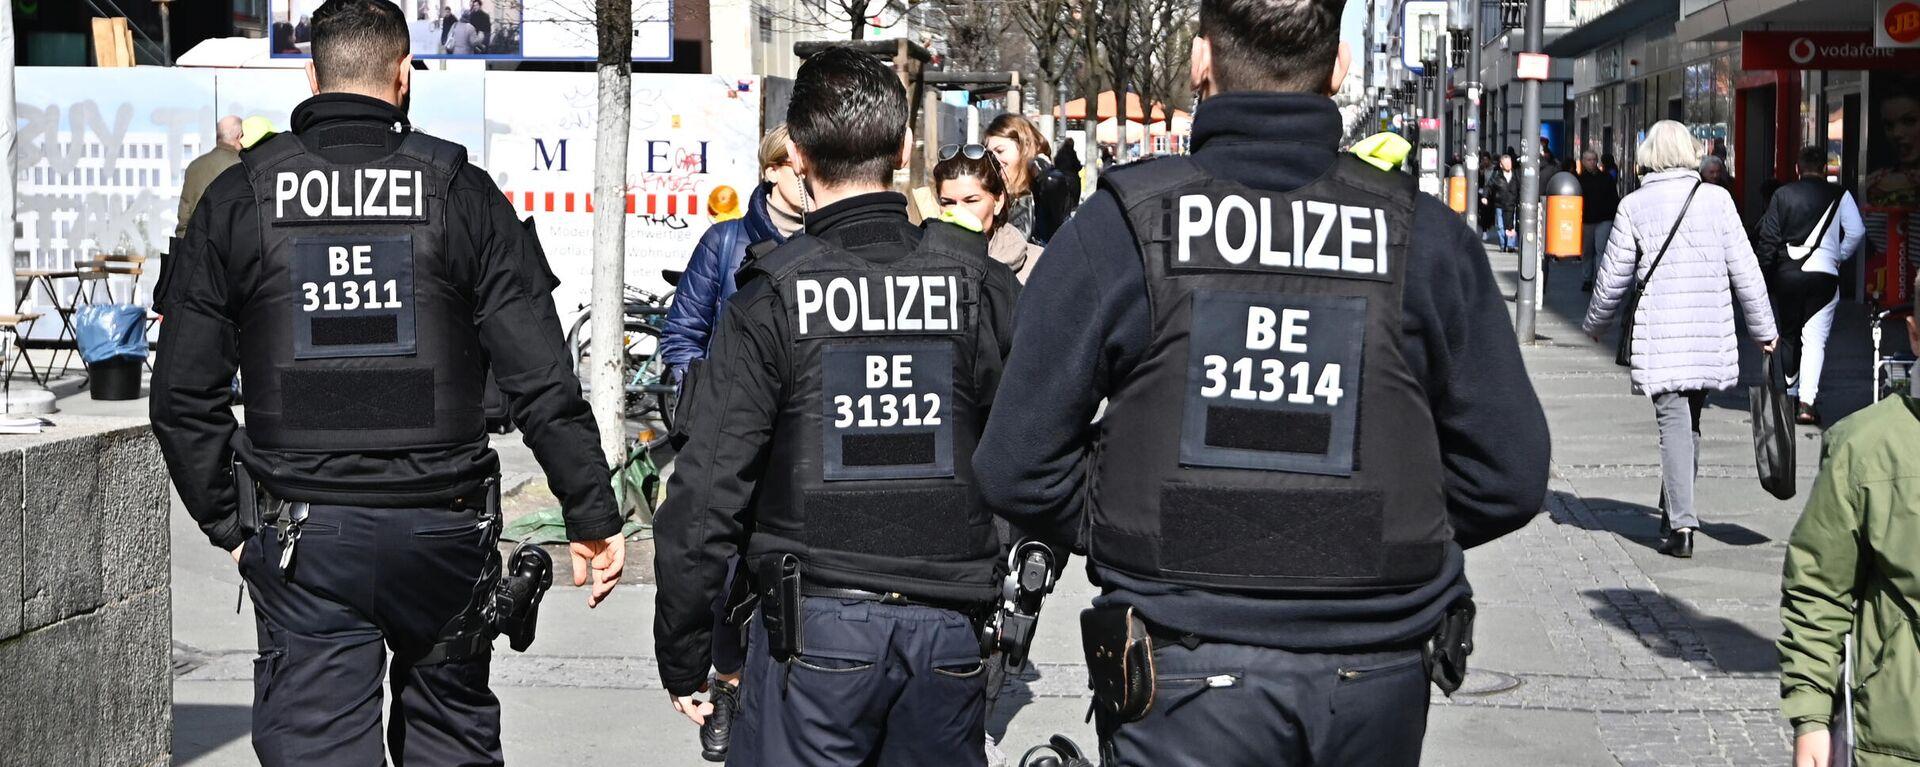 Polizei in Berlin - SNA, 1920, 20.01.2021